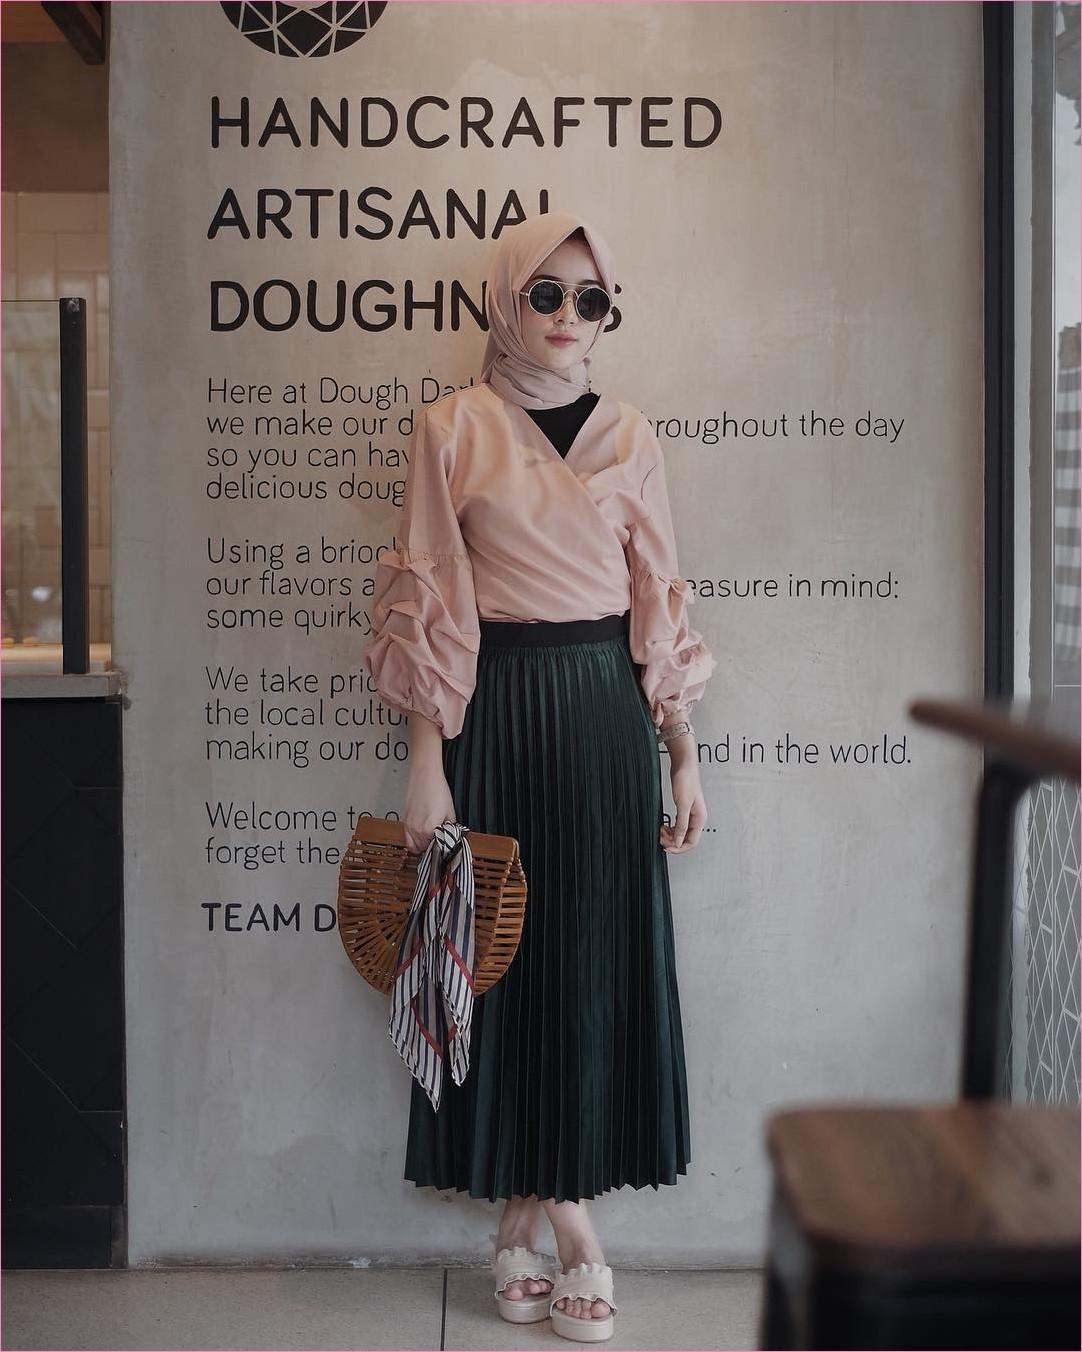 Outfit Rok Untuk Hijabers Ala Selebgram 2018 loafers and slip ons sandals kerudung segiempat hijab square top blouse krem muda kacamata bulat mangset hitam handbags bambu rotan coklat roomstick skirt hijau tua ootd trendy